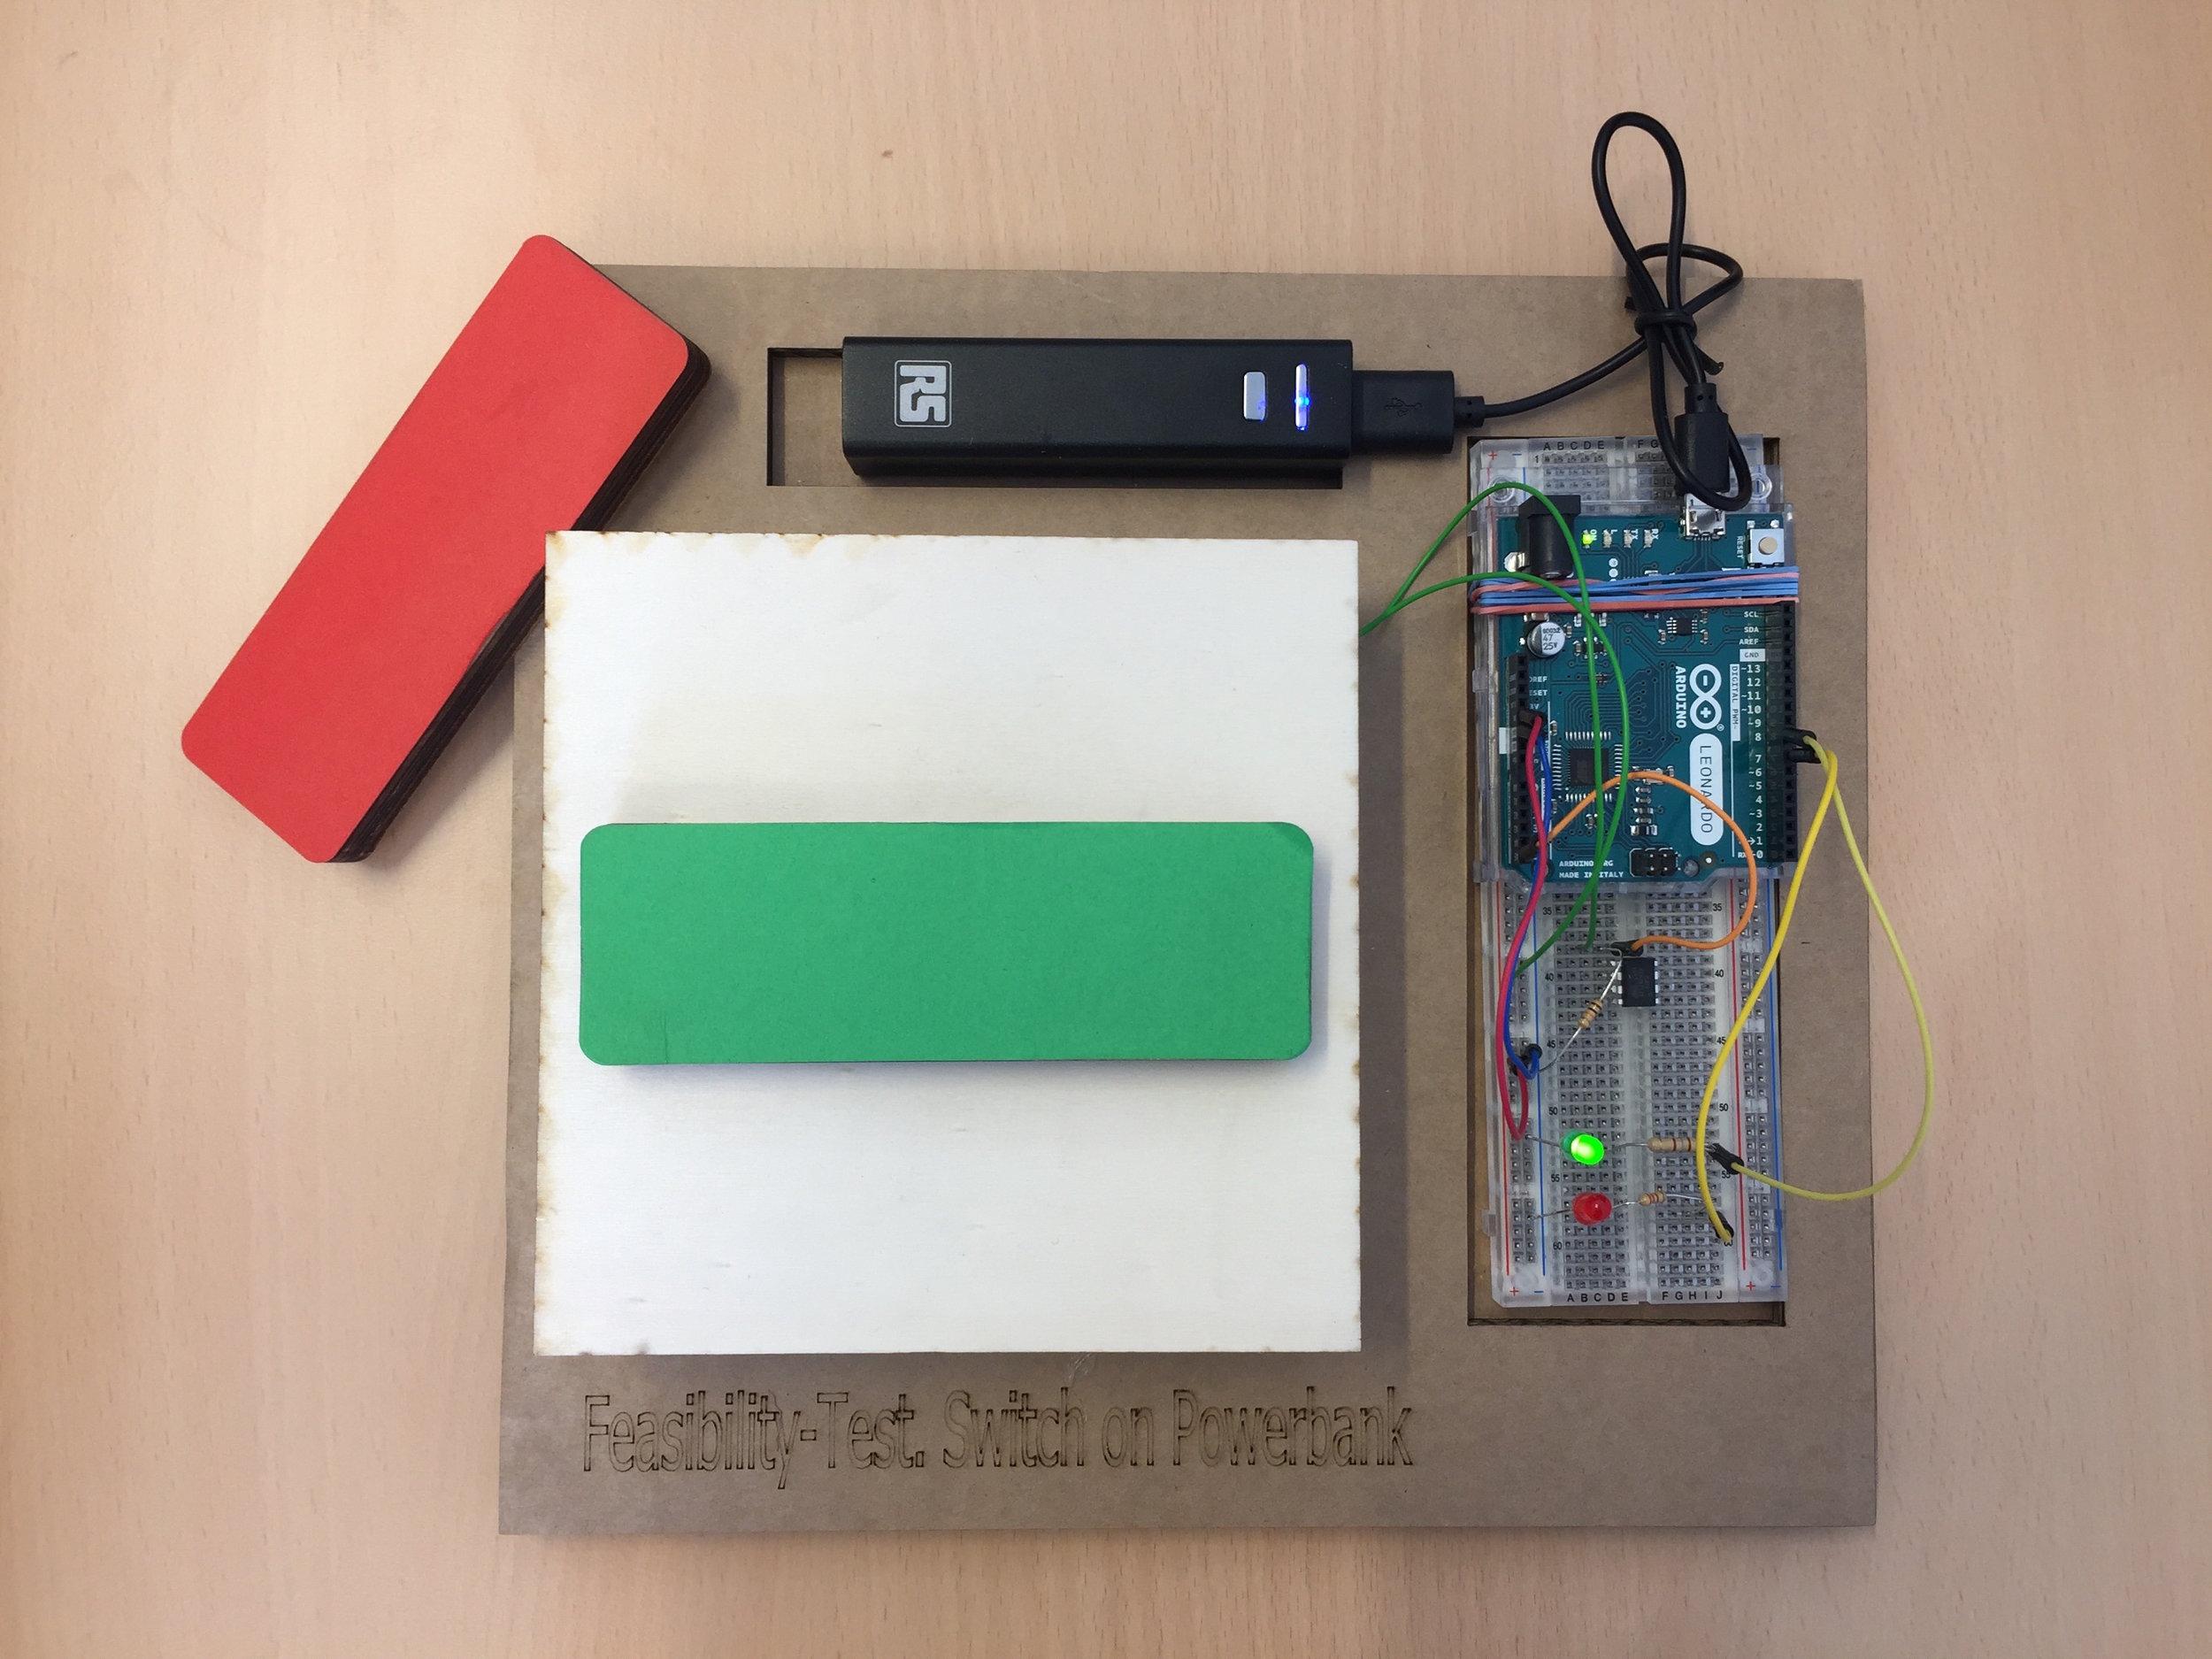 Green block activating green LED